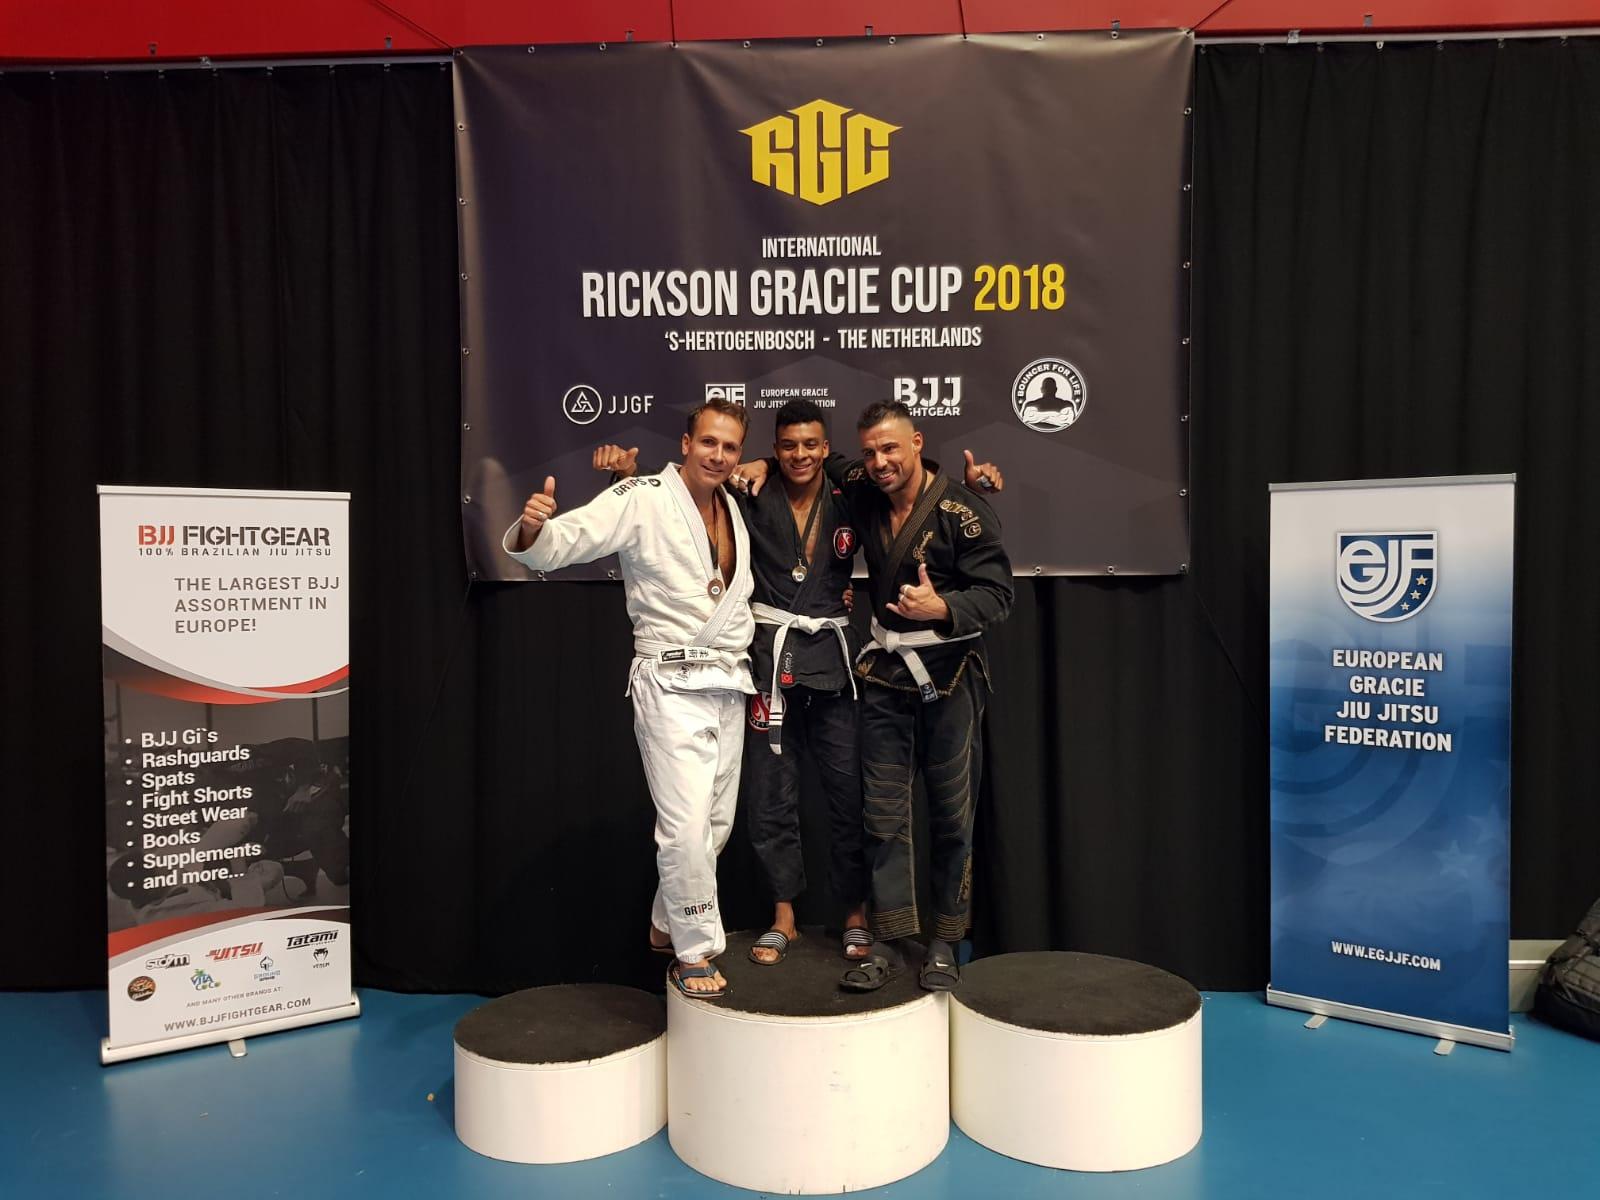 gracie-jiu-jitsu-gouda_bjj-braziliaans-jiu-jitsu-zelfverdediging_selfdefense-logo-dojo-rickson-gracie-cup-2018-sebastiaan-brons-1